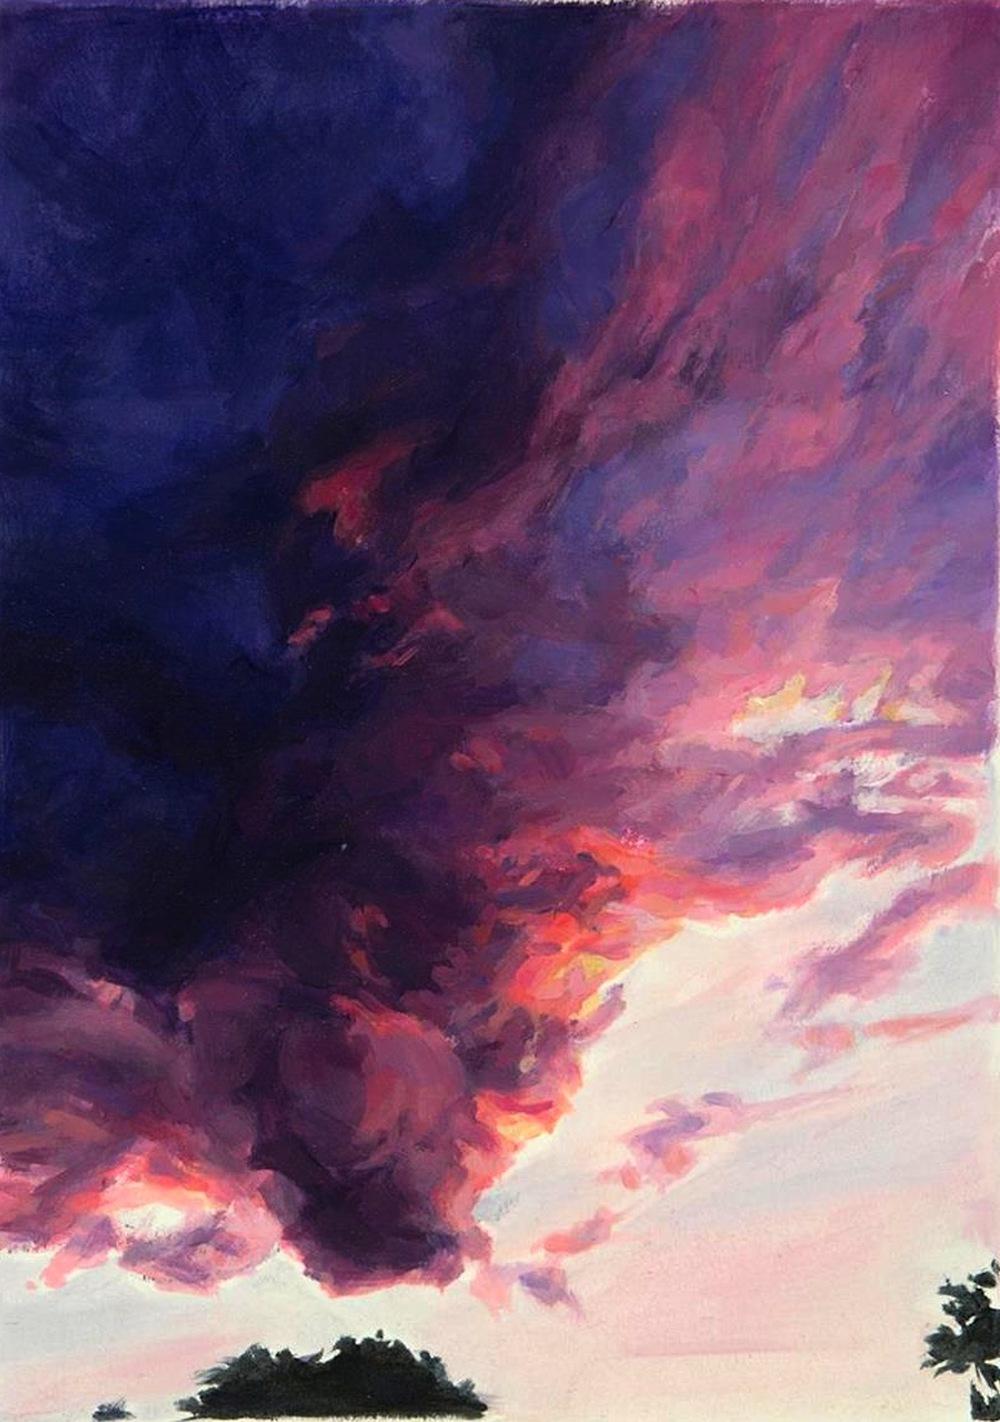 Linda Pearlman Karlsberg,   Roseate and Indigo  , oils, 17x21, $2,400